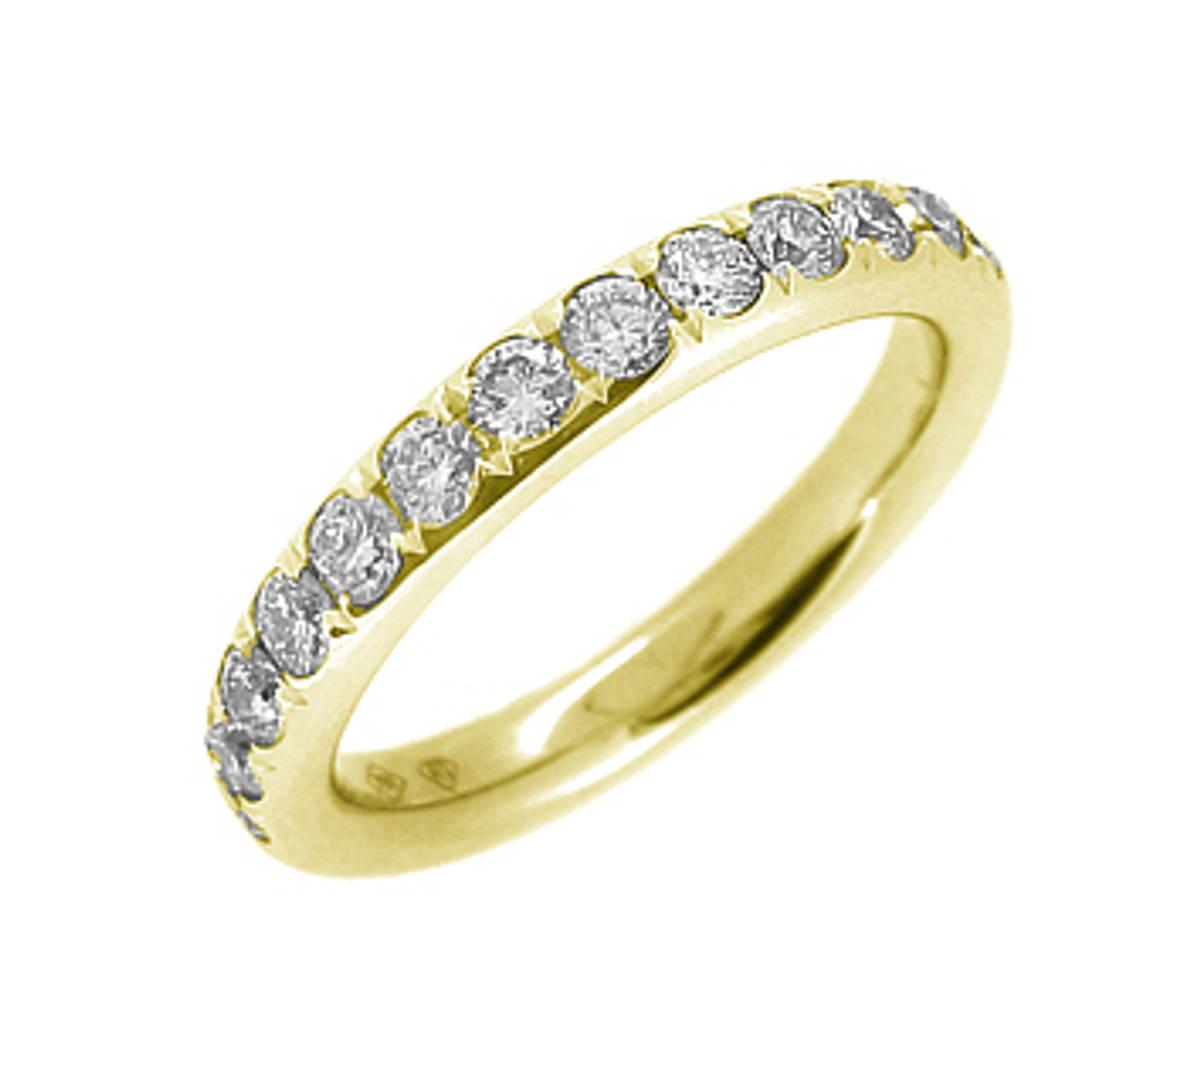 18k yellow gold brilliant cut diamond eternity ring Carat: total diamond weight 0.43cts Metal: 18k yellow gold